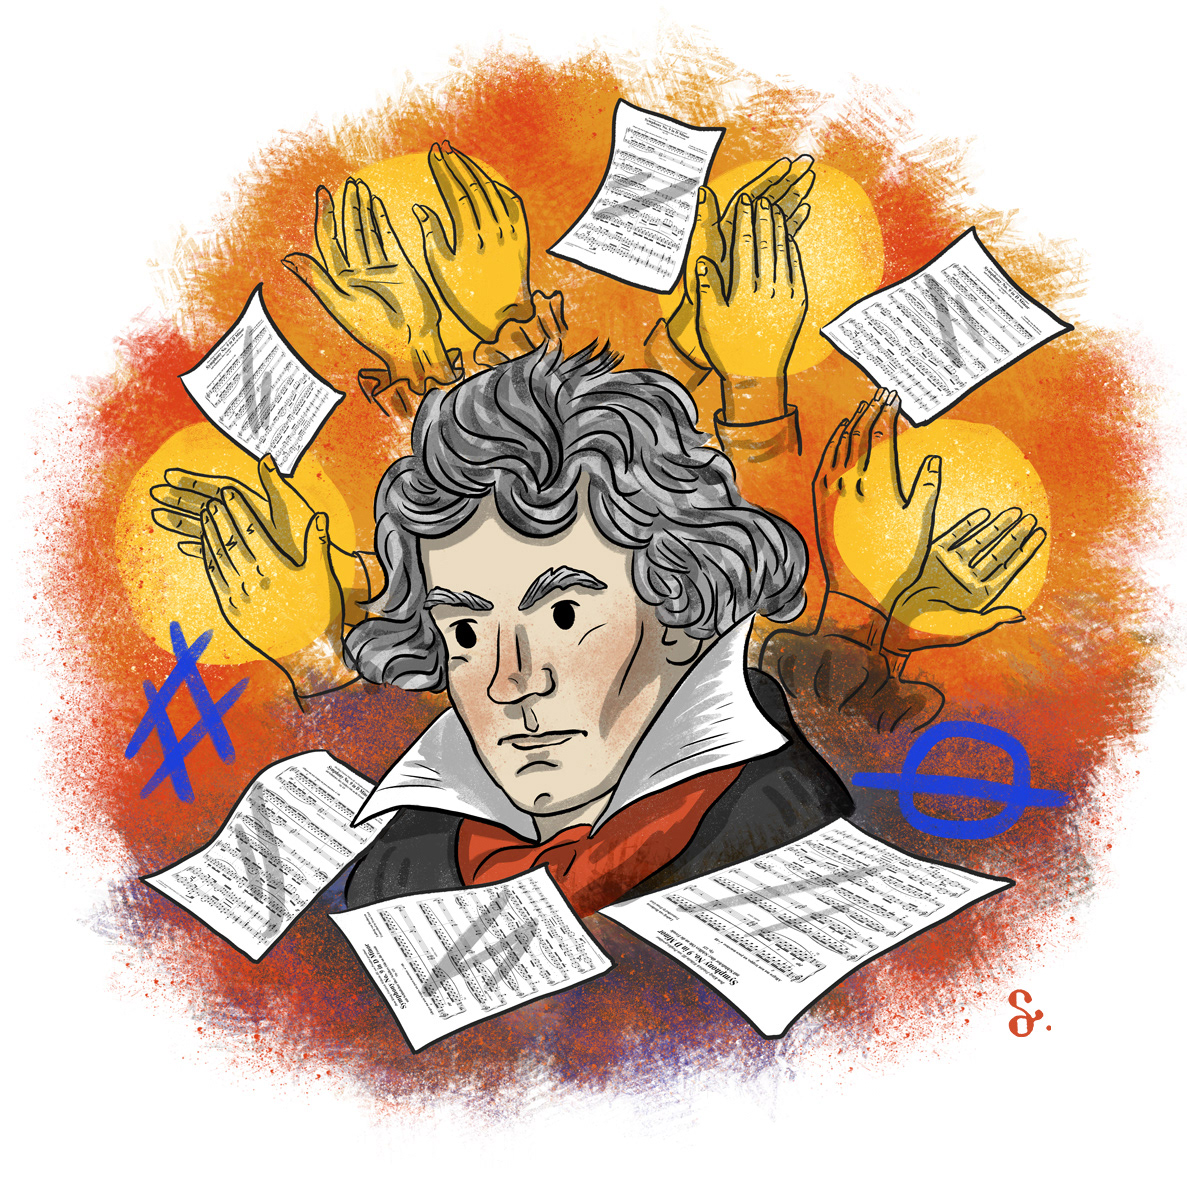 Composers beethoven prokofiev composing music classical music musicians Piano Klasik Müzik notes